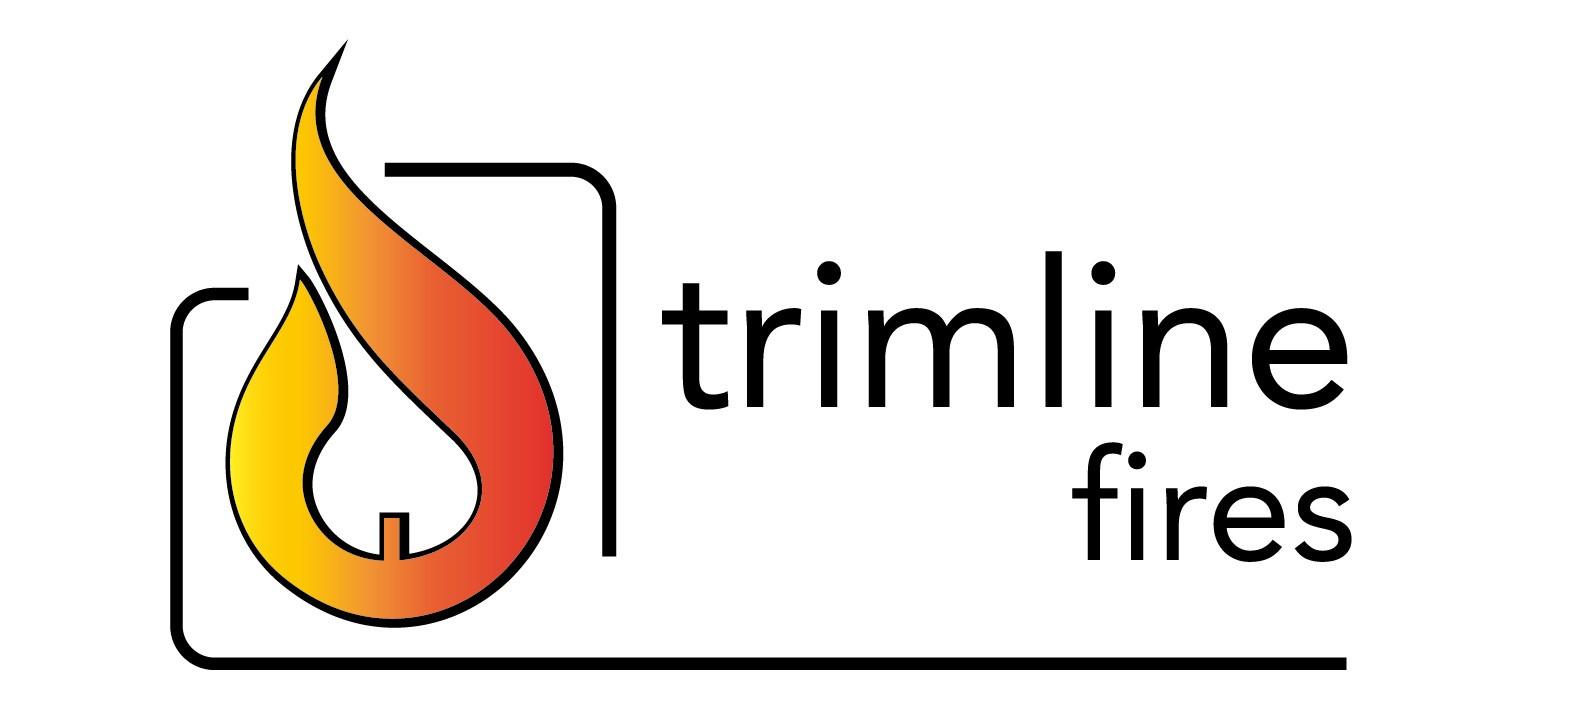 TrimlineFires_logo kandalloshop